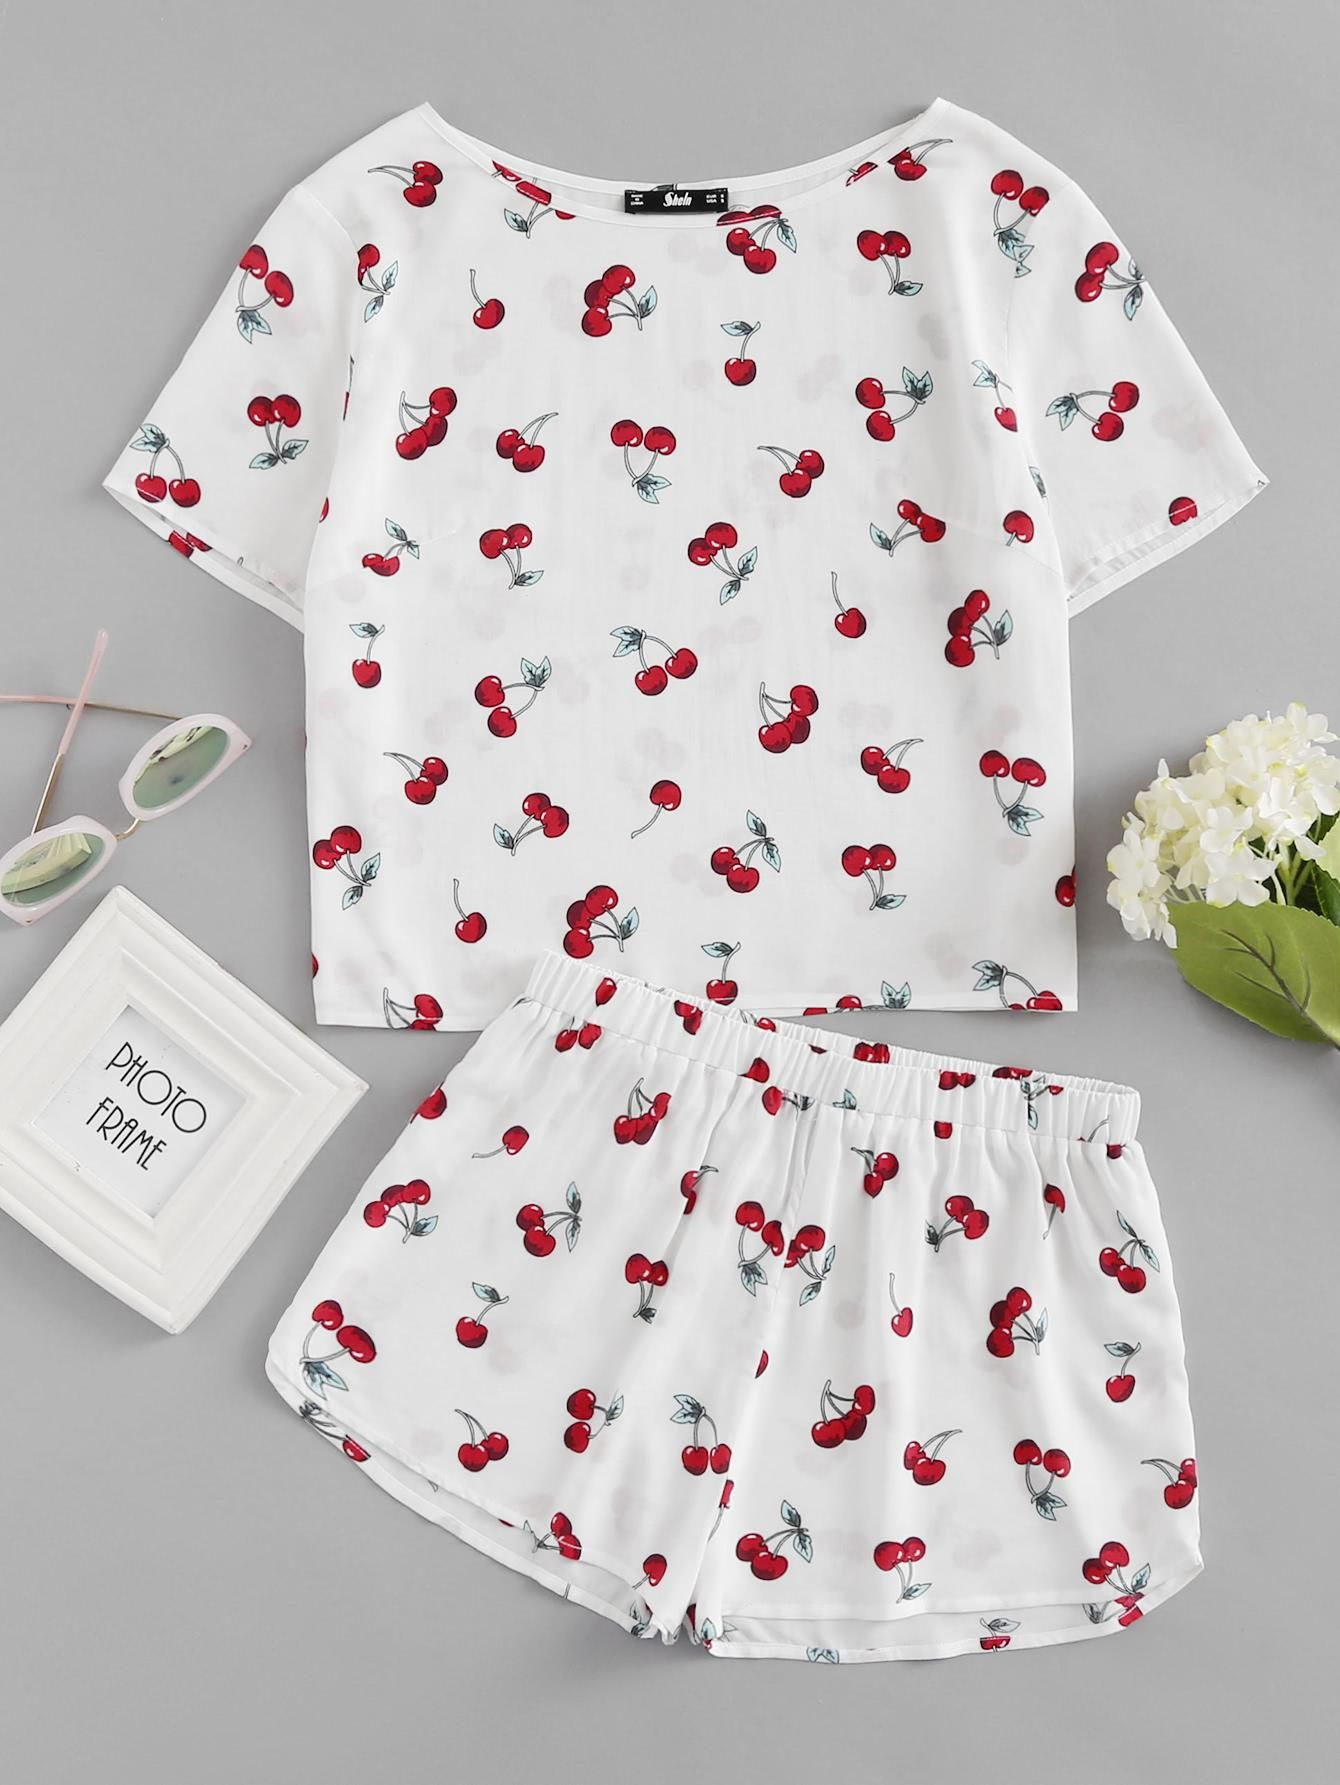 875d6d8989 SheIn - #SheIn Cherry Print Top And Shorts Pajama Set - AdoreWe.com ...